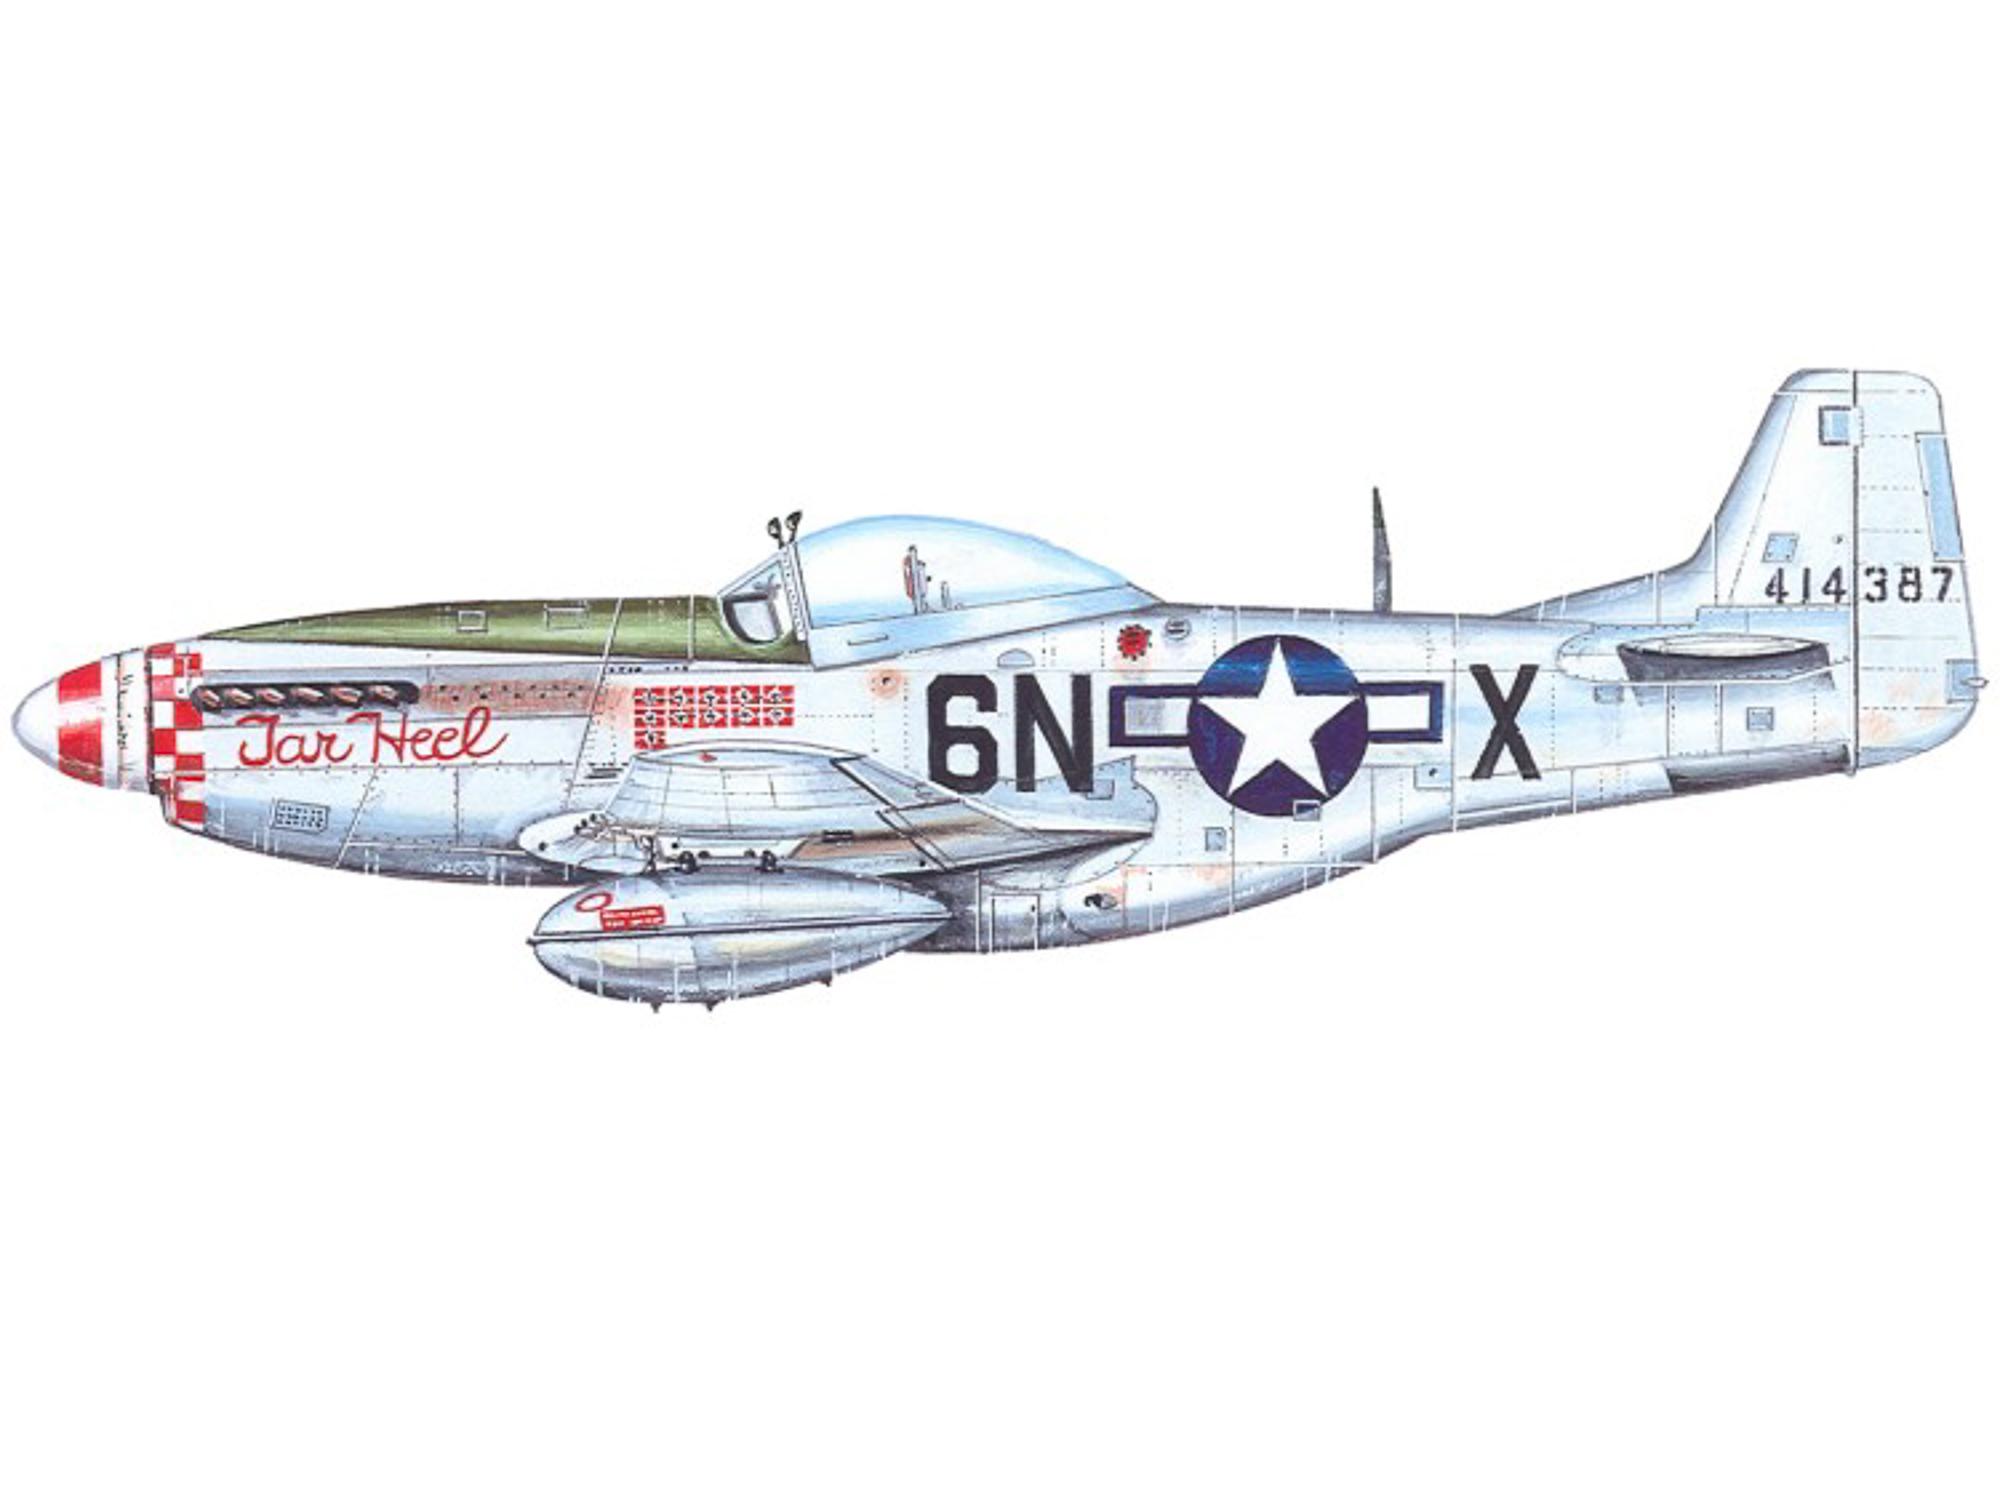 P-51D – Tar Heel - 44-14387